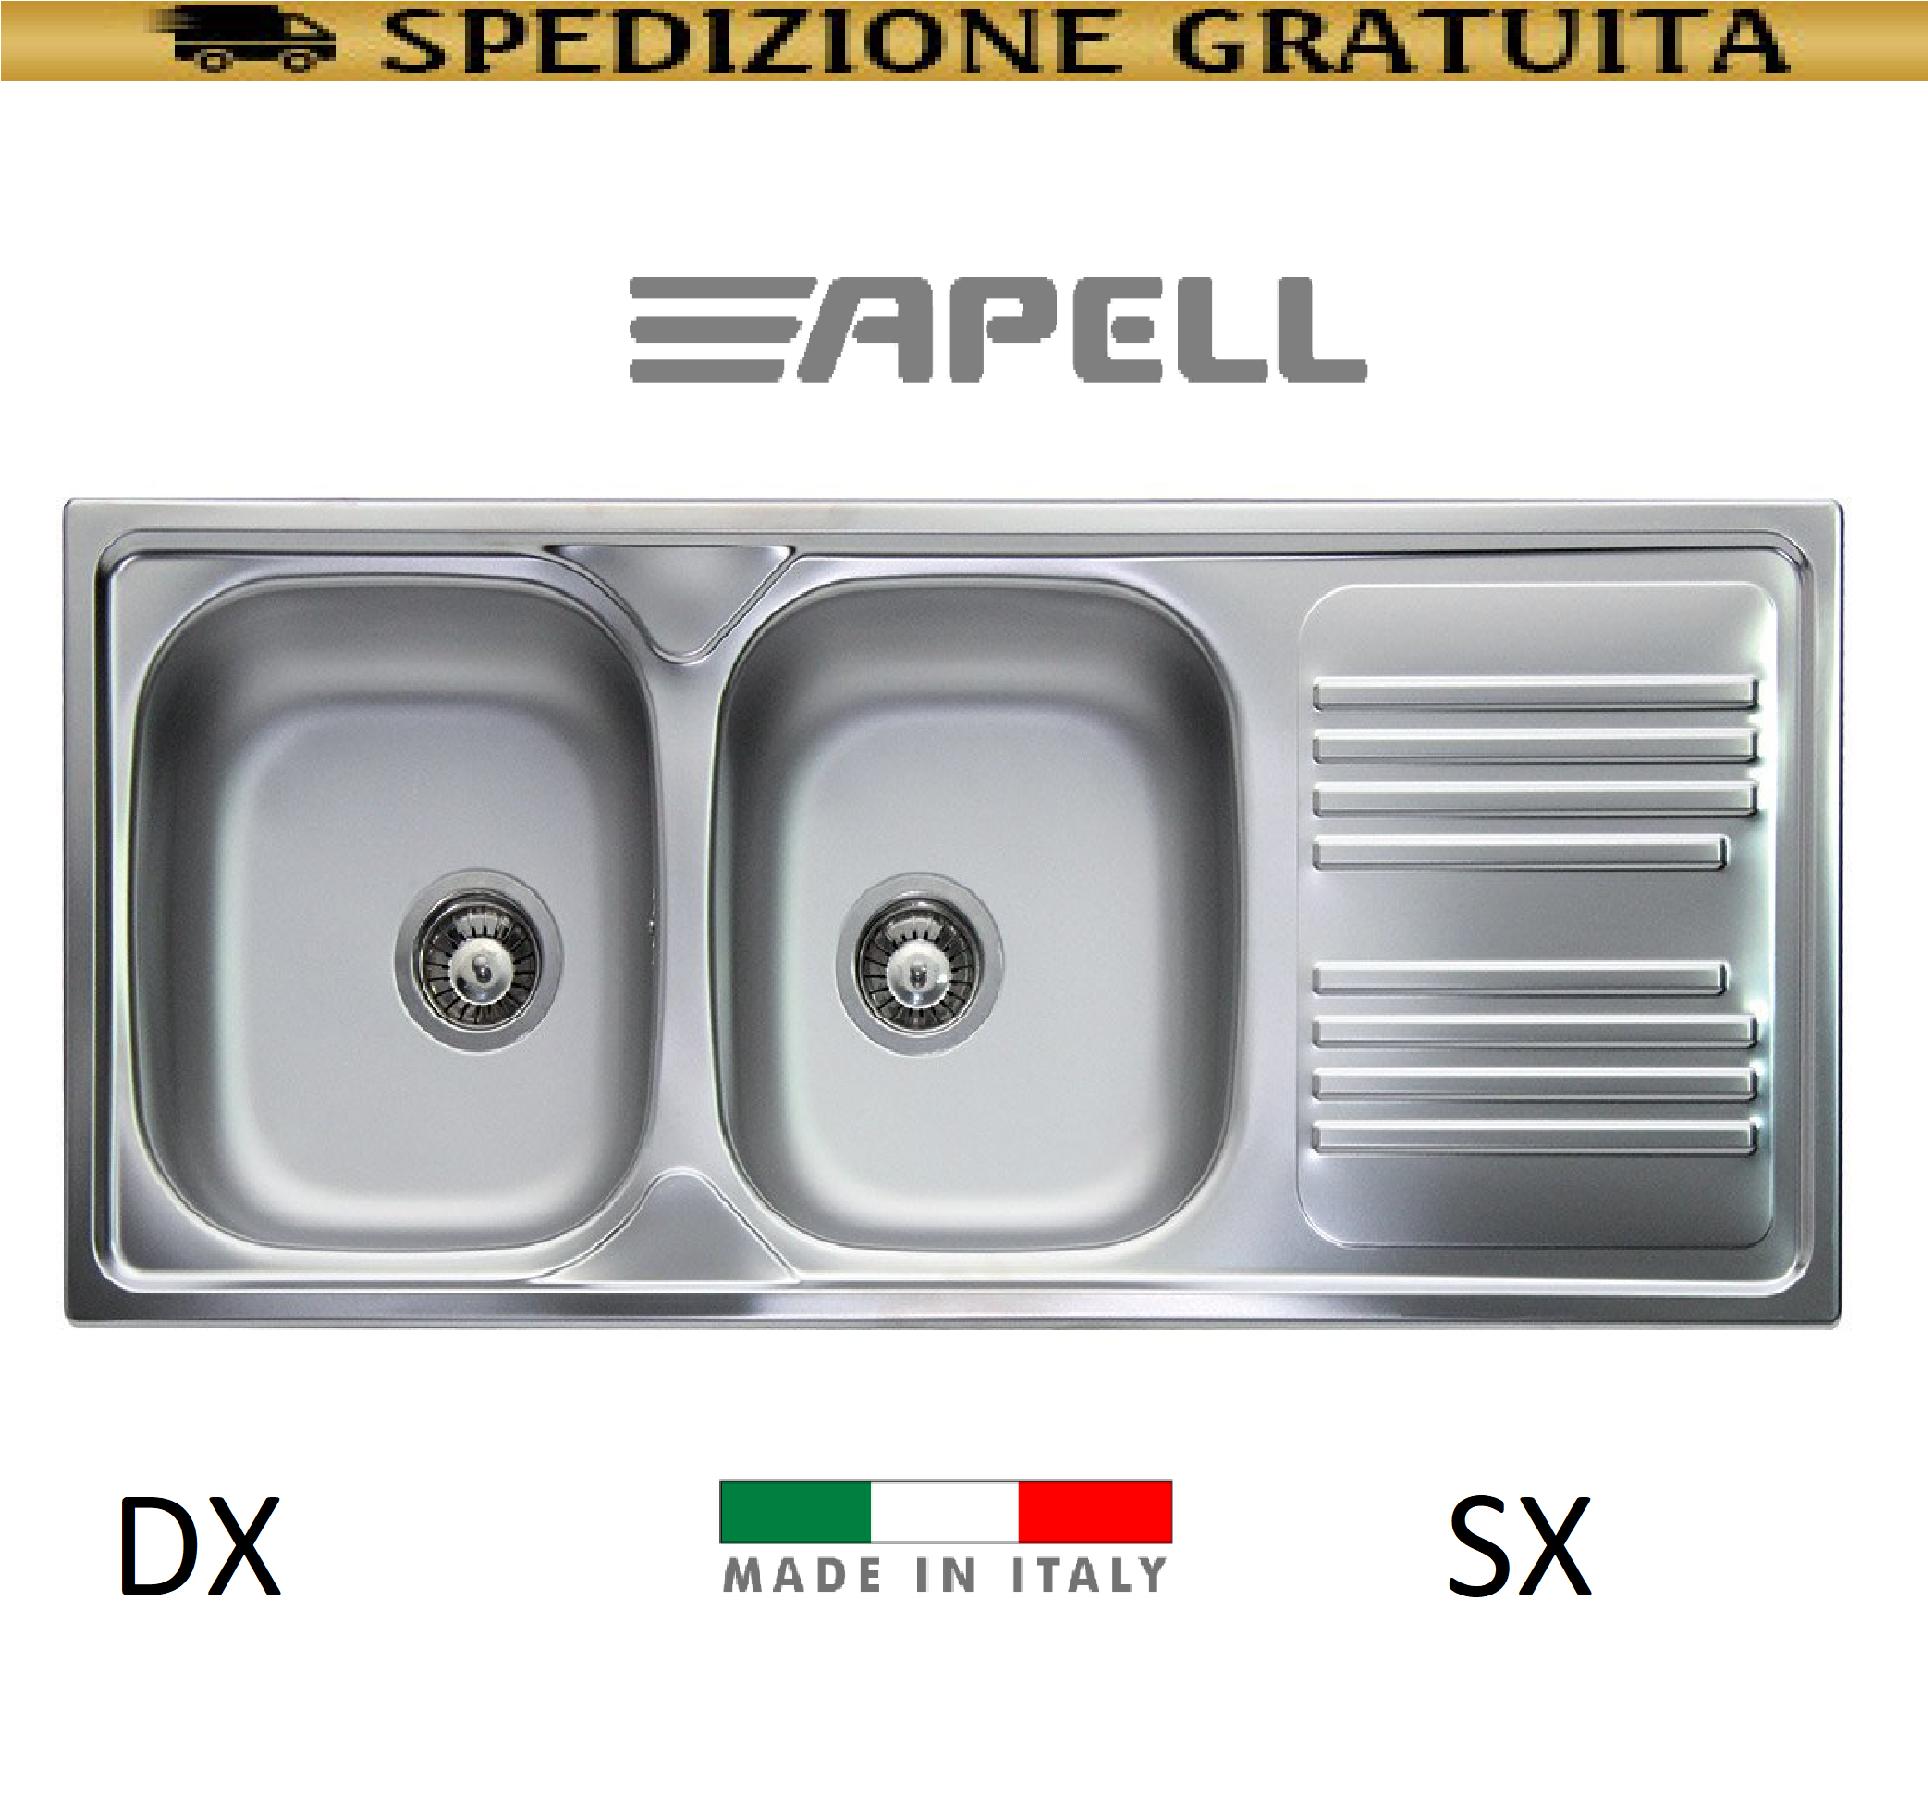 LAVELLO CUCINA INCASSO ACCIAIO INOX 2 VASCHE + GOCCIOLATOIO APELL MADE IN  ITALY